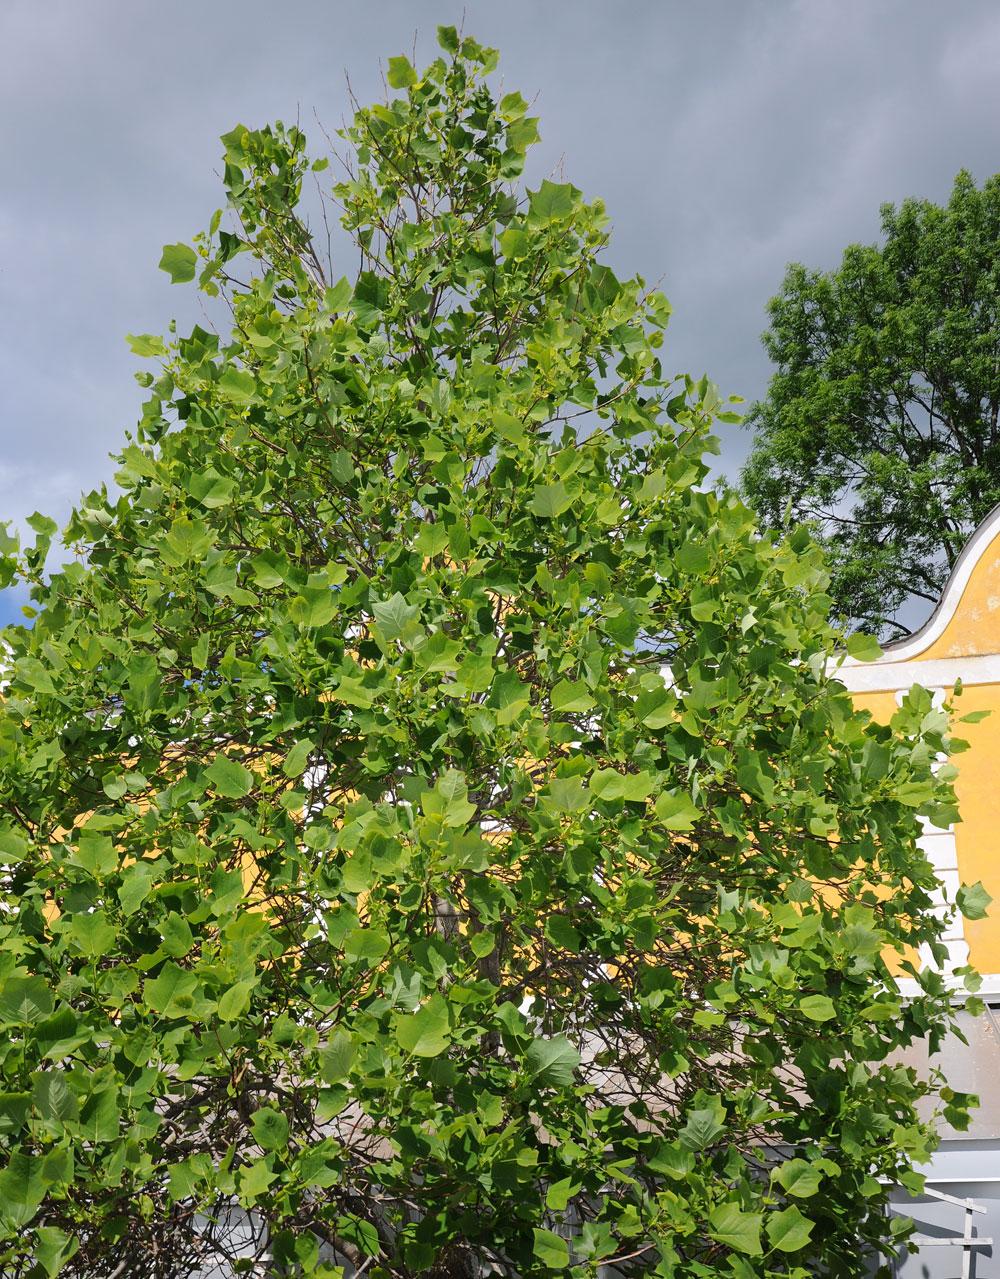 What Is A Sedan >> Tulpanträd | Buskar och Träd | Liriodendron tulipifera